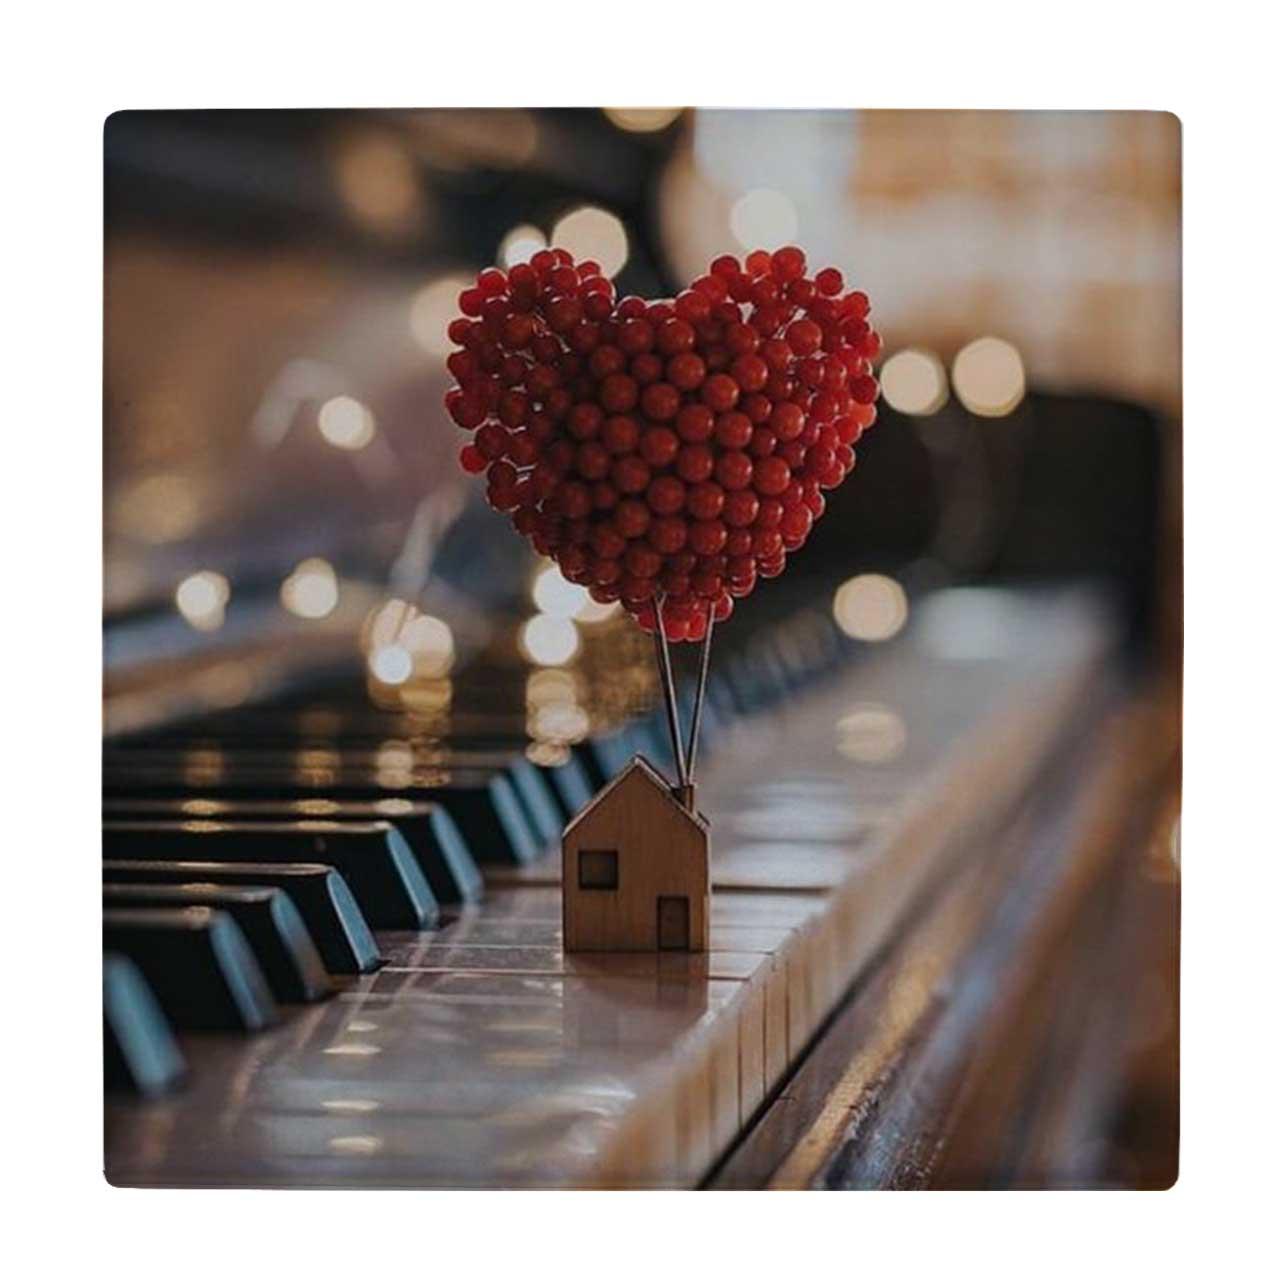 خرید                                         کاشی طرح پیانو و ماکت کلبه کد wk3386